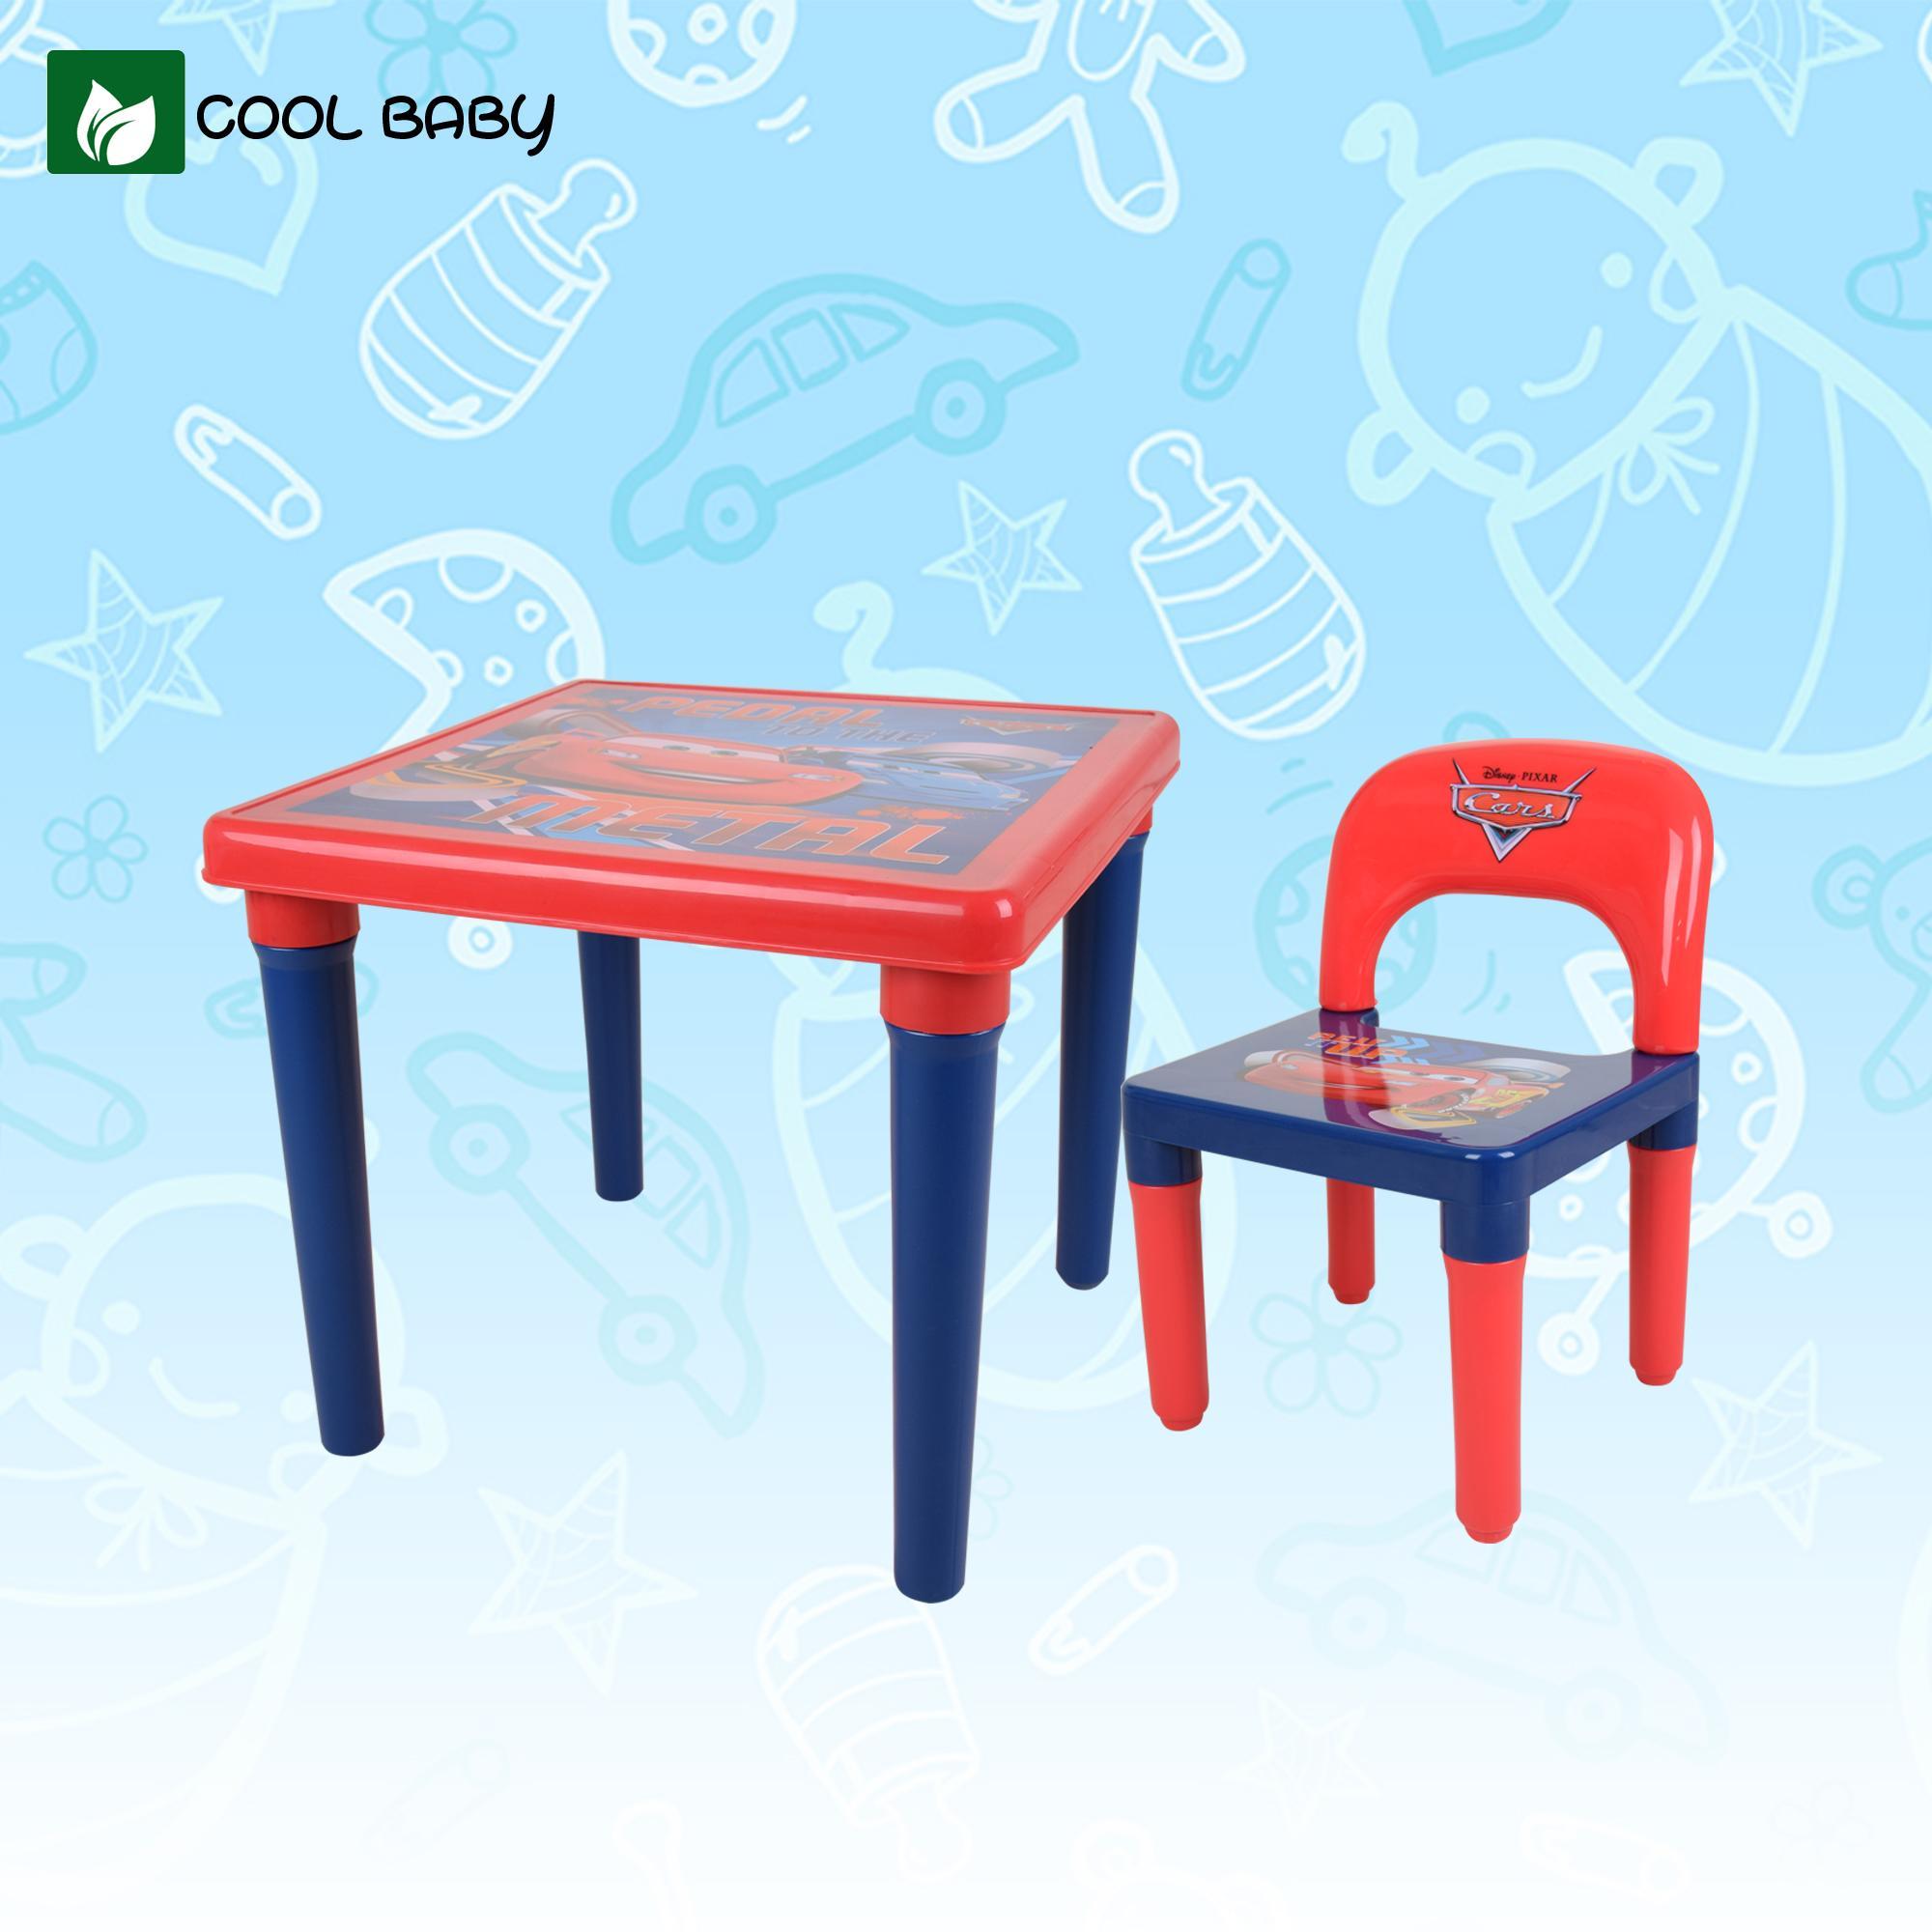 Surprising Kids Futniture For Sale Baby Furniture Prices Brands Evergreenethics Interior Chair Design Evergreenethicsorg